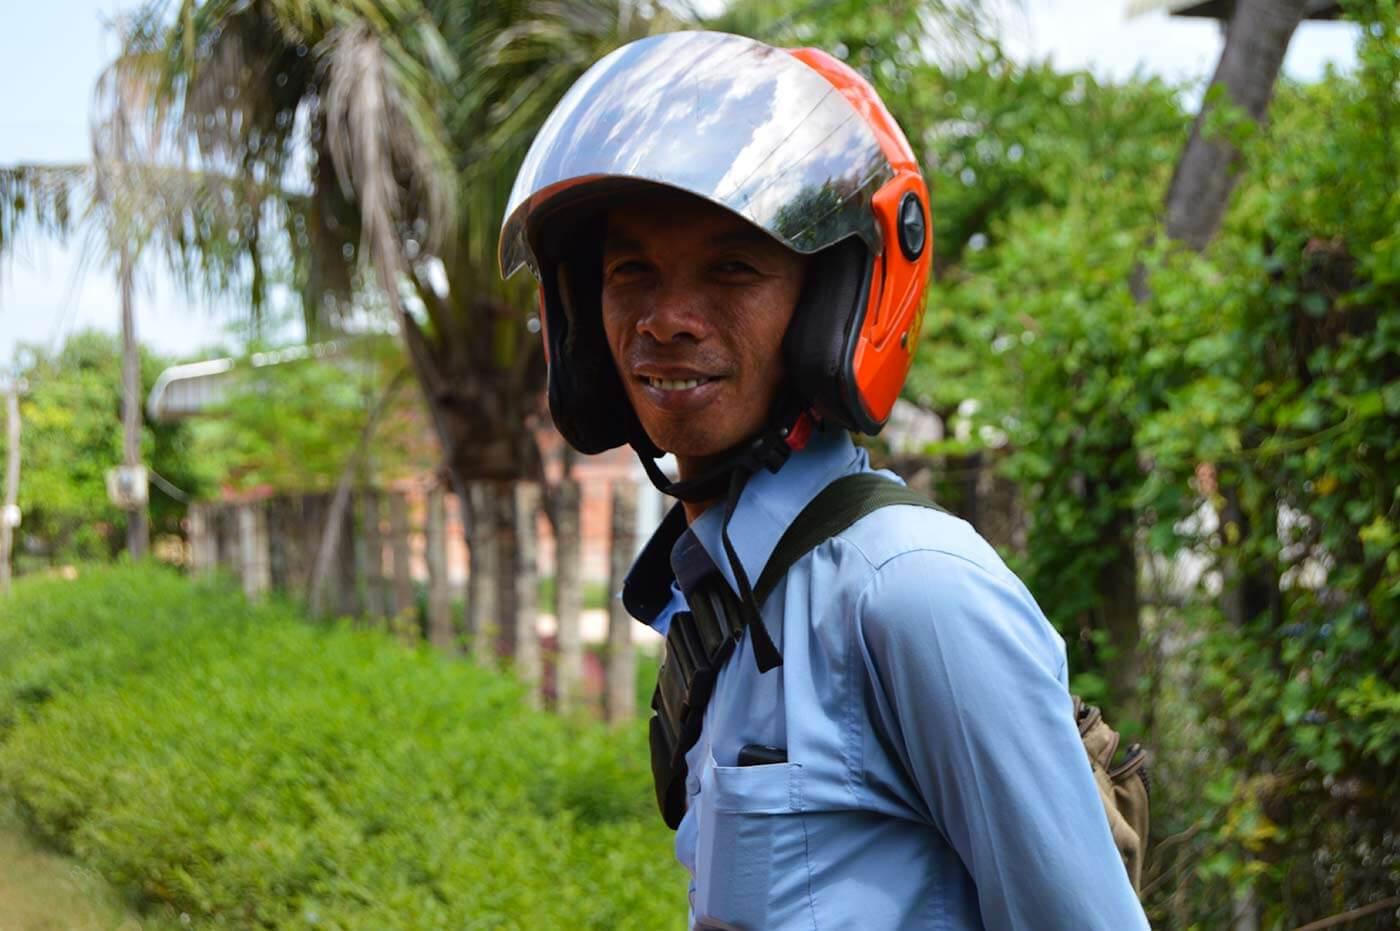 Mainn, der beste Tuk Tuk Fahrer im Süden von Siem Reap *Fotostory*